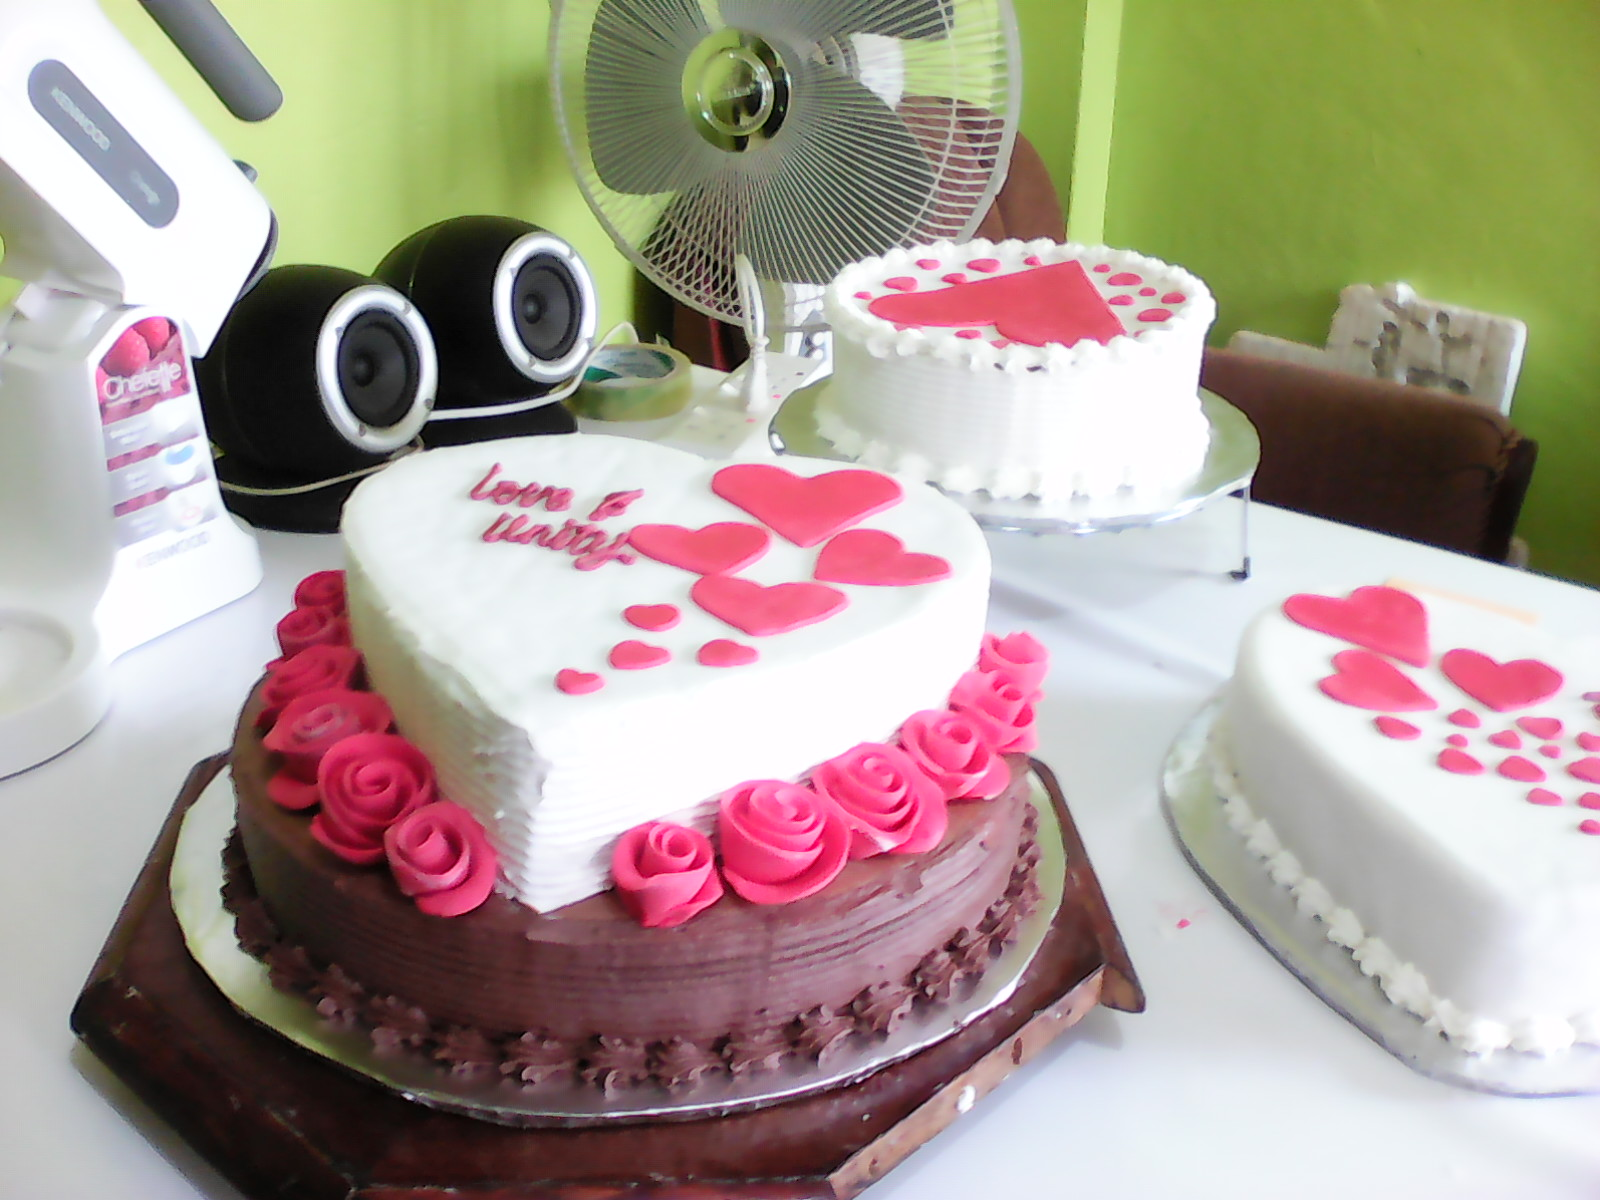 Home Baking Uganda: 02/16/16